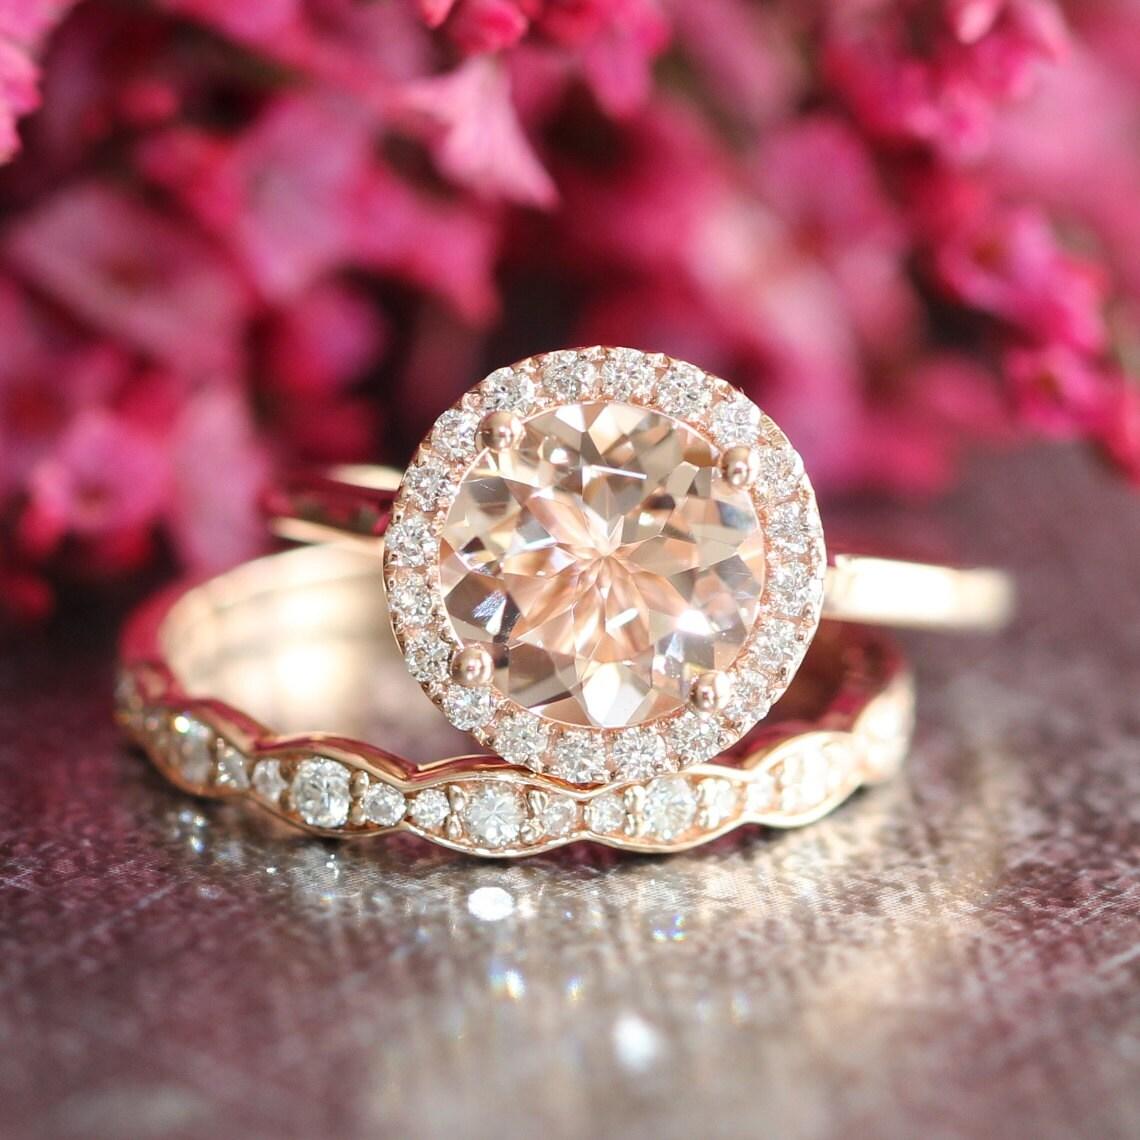 rose gold morganite wedding set diamond scalloped wedding band. Black Bedroom Furniture Sets. Home Design Ideas